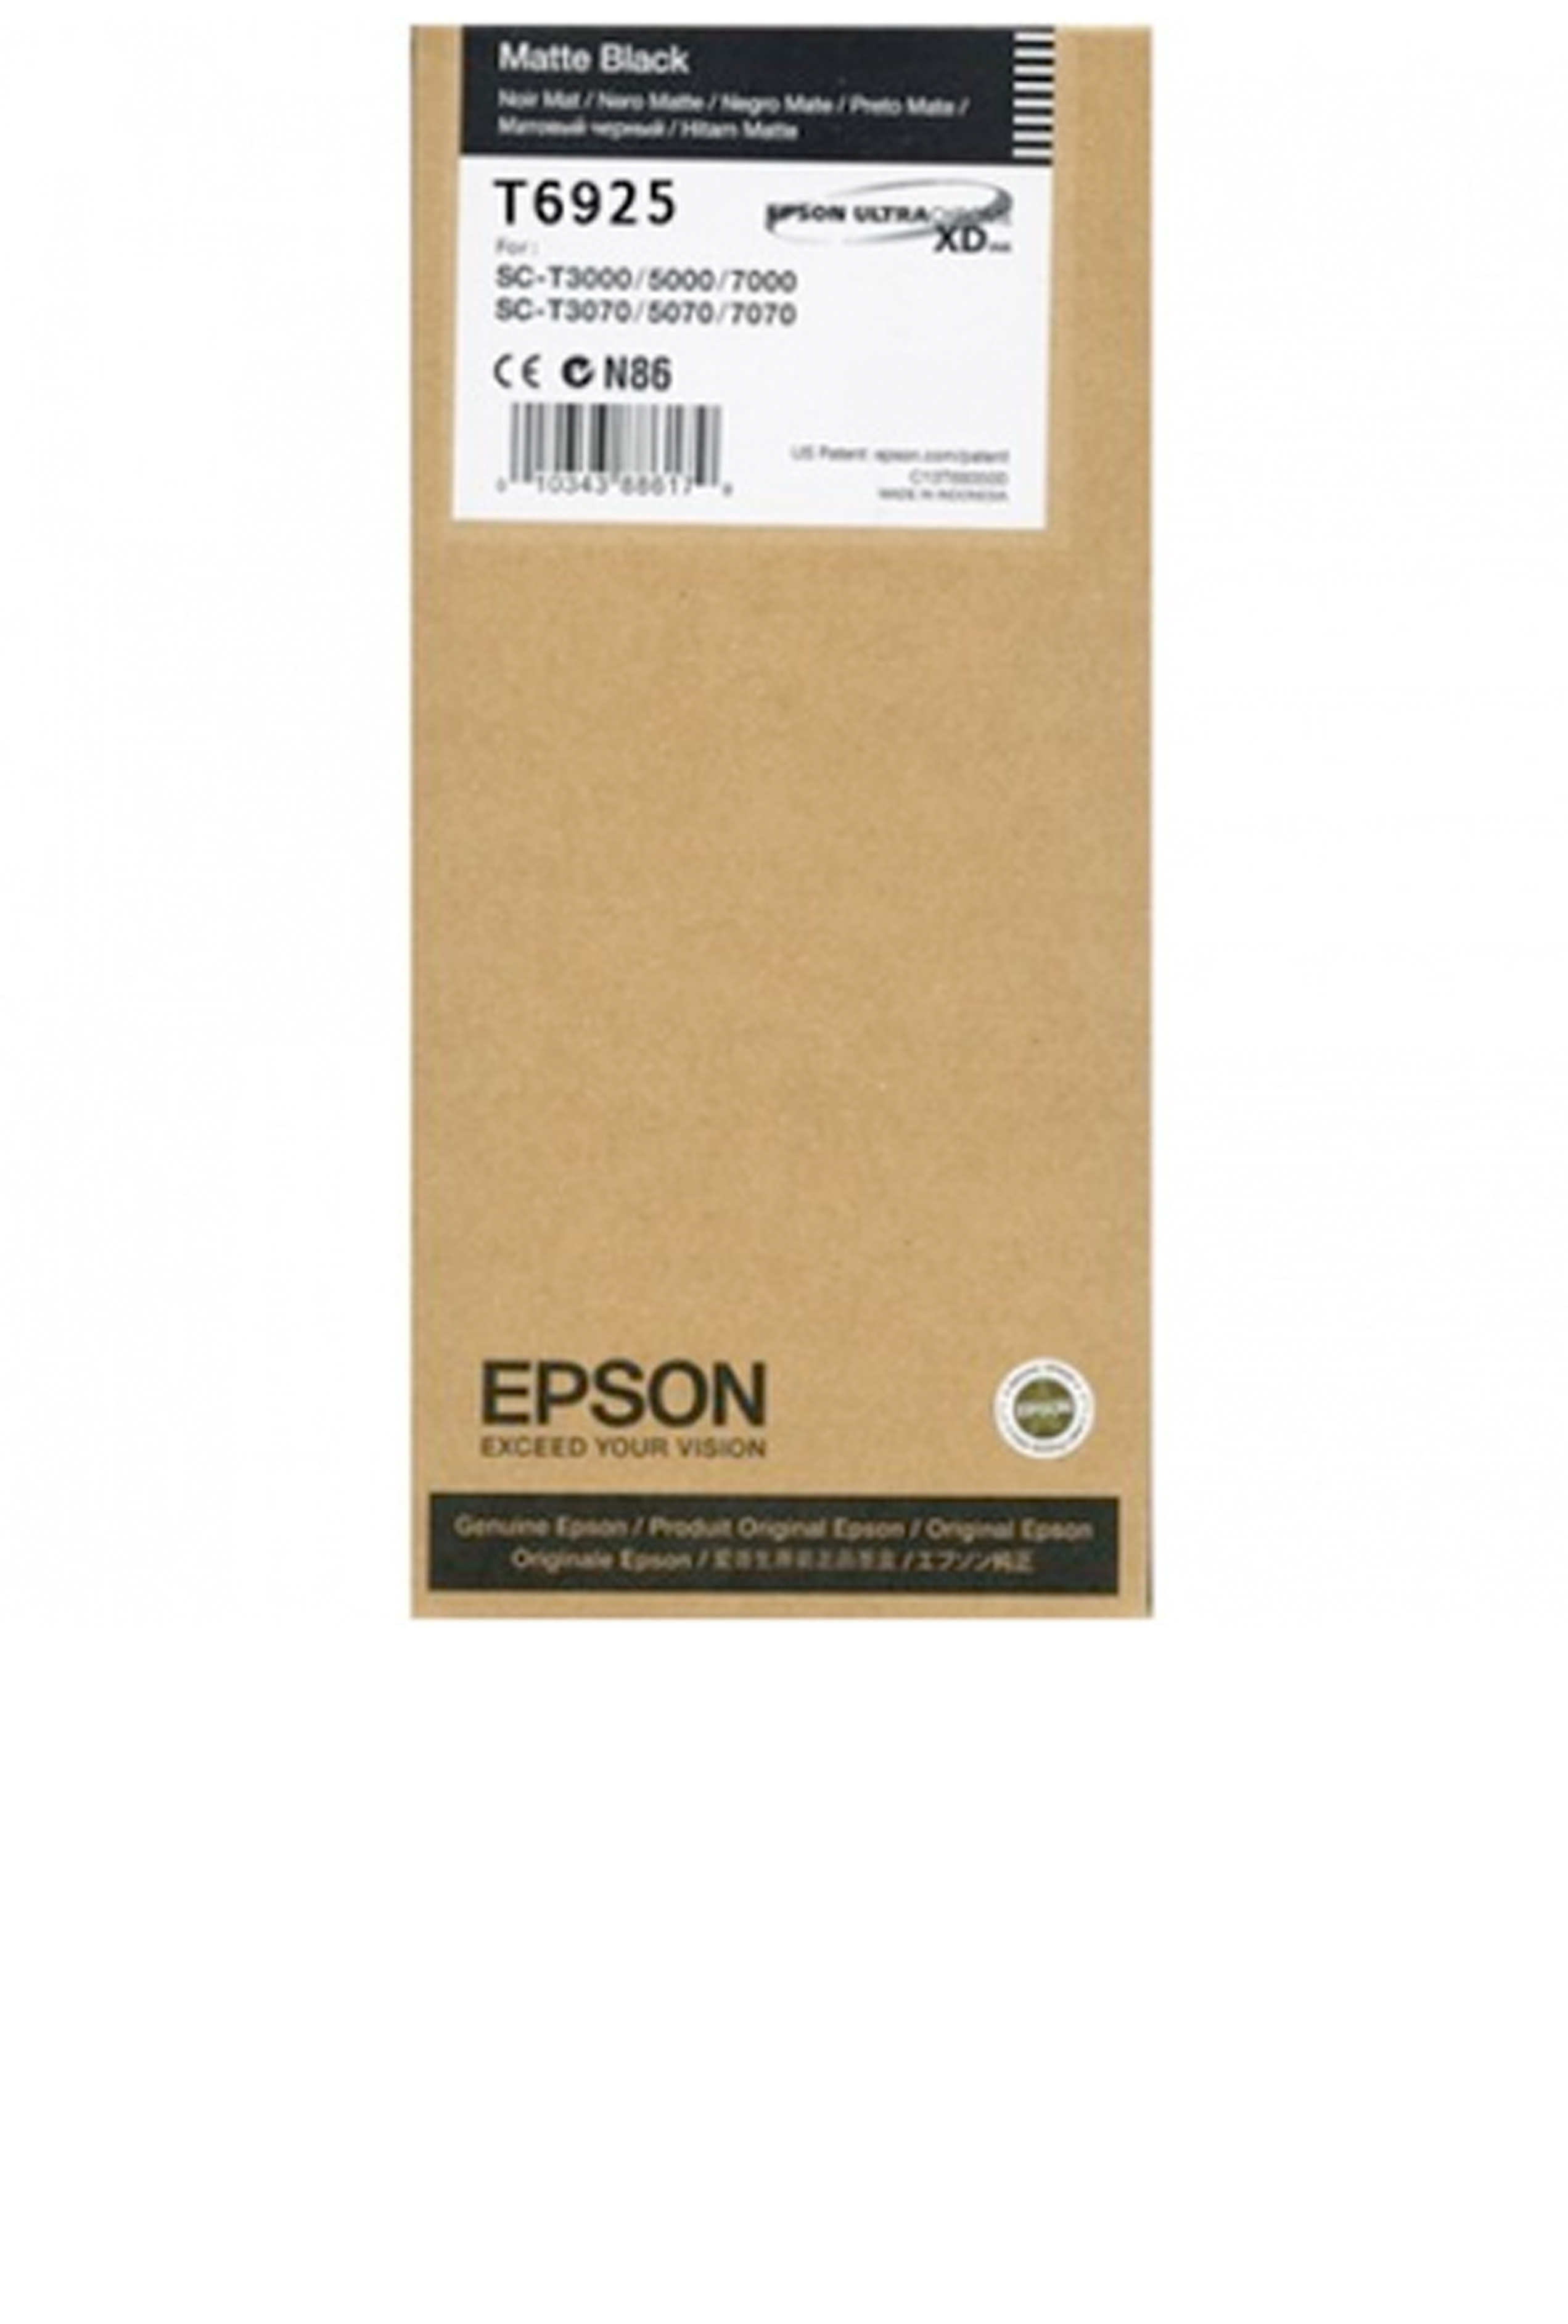 Epson EPSON LW MATTE BLACK INK (110 ML) (T692500)